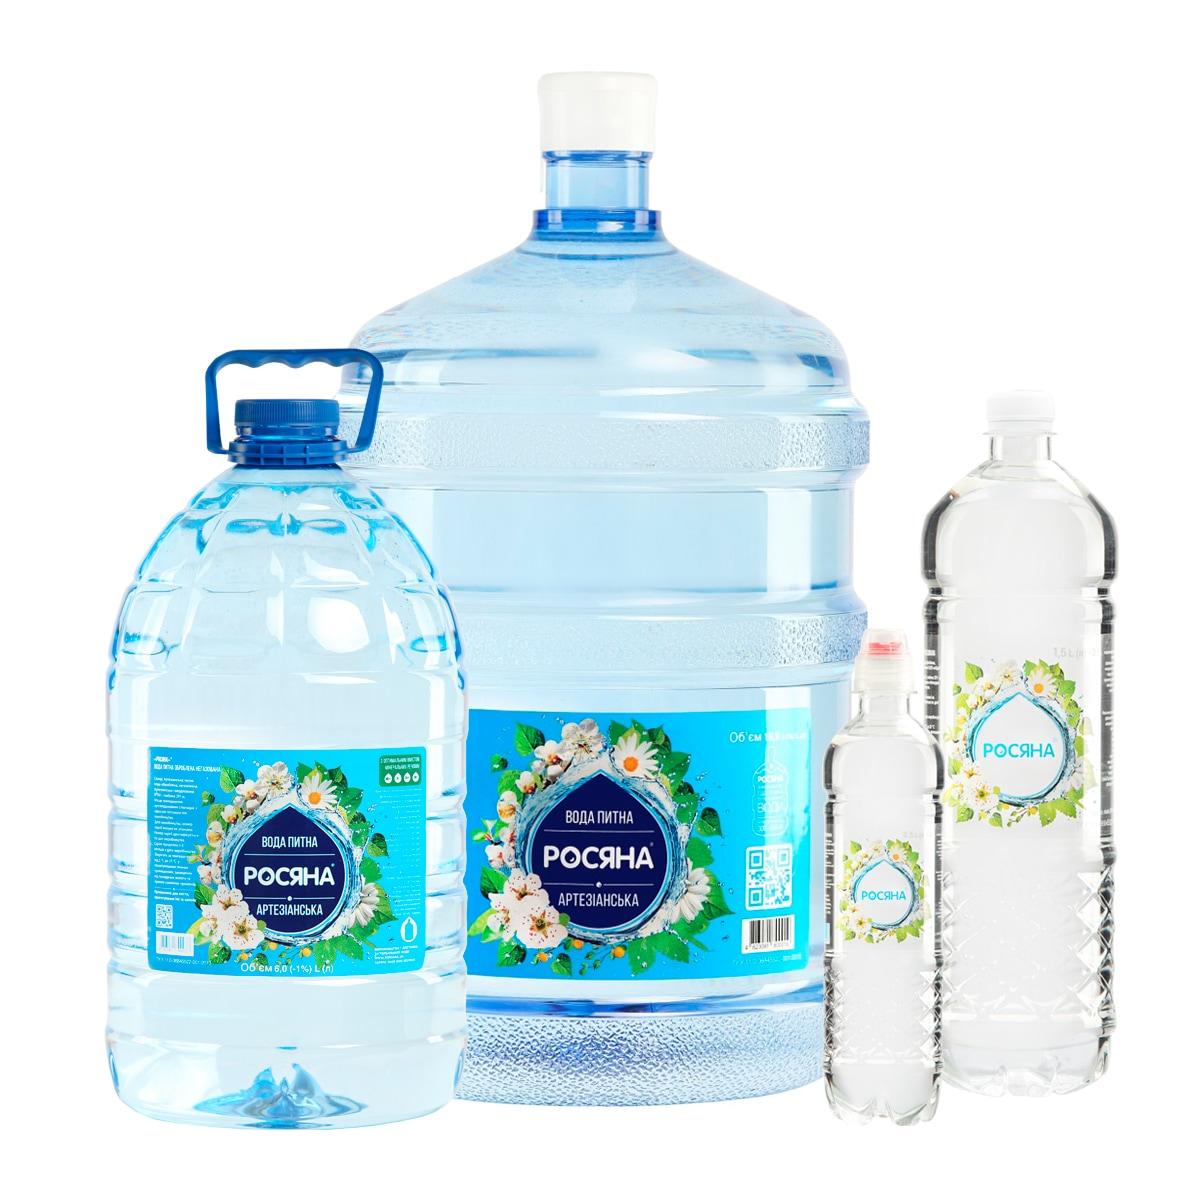 Вода питна Росяна™ - доставка воды - rosiana.ua - 380-44-303-999-3